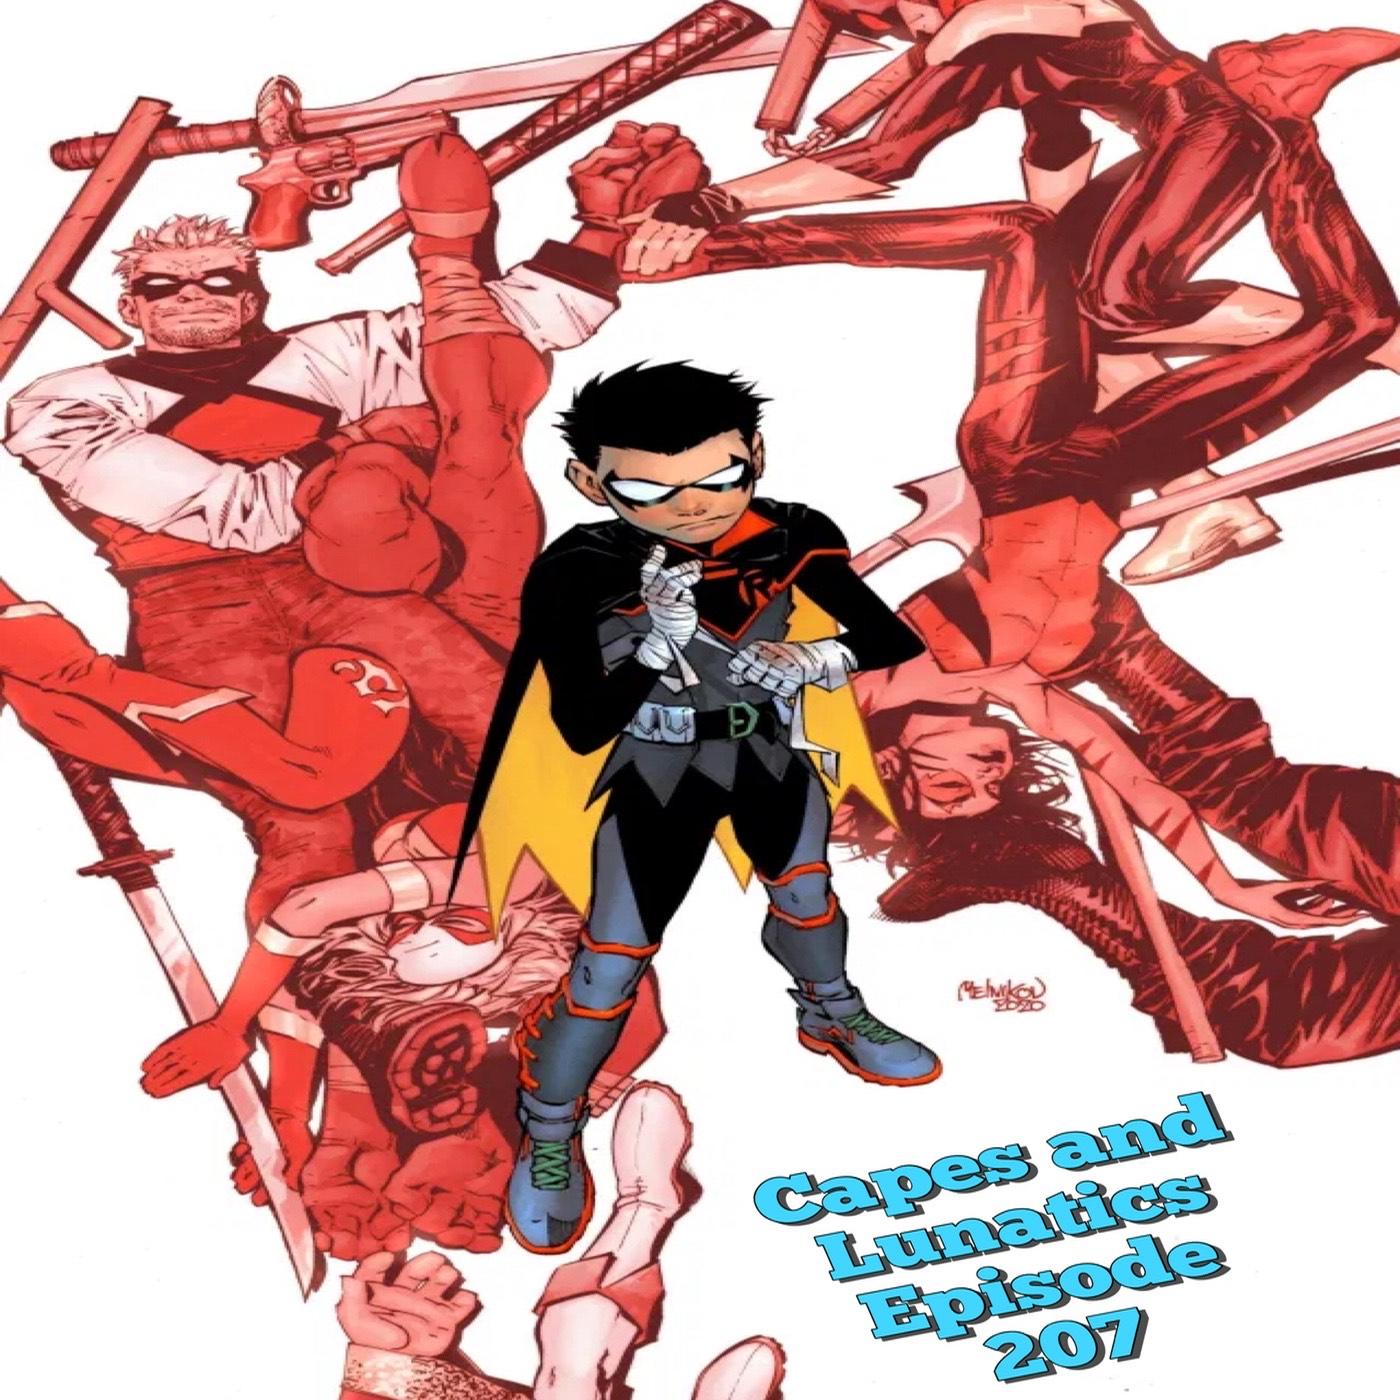 Capes and Lunatics Ep #207: Robin #1, Black Widow #6